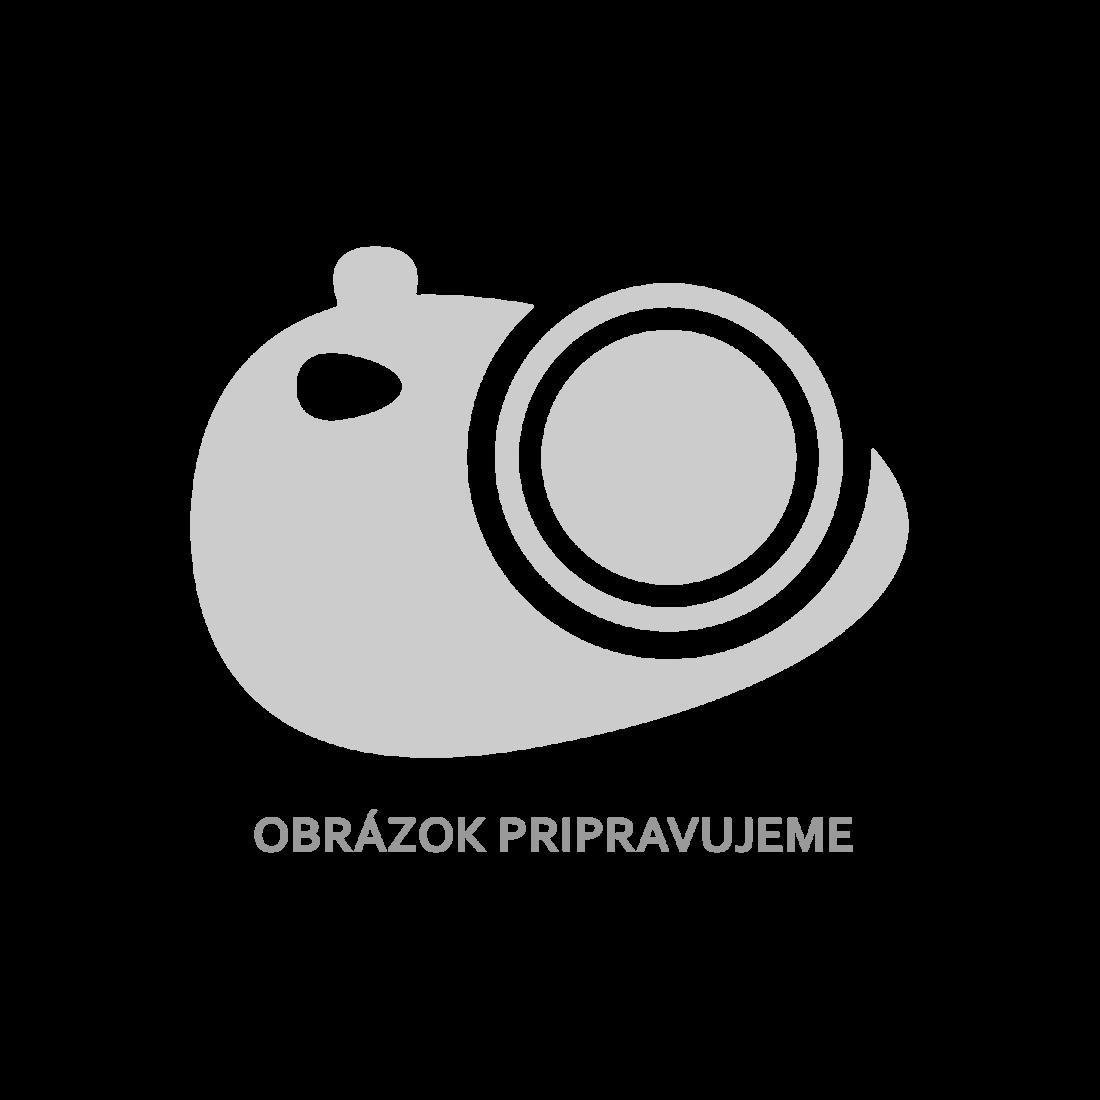 Stojaca markíza pre teras 160 x 300 cm čierna